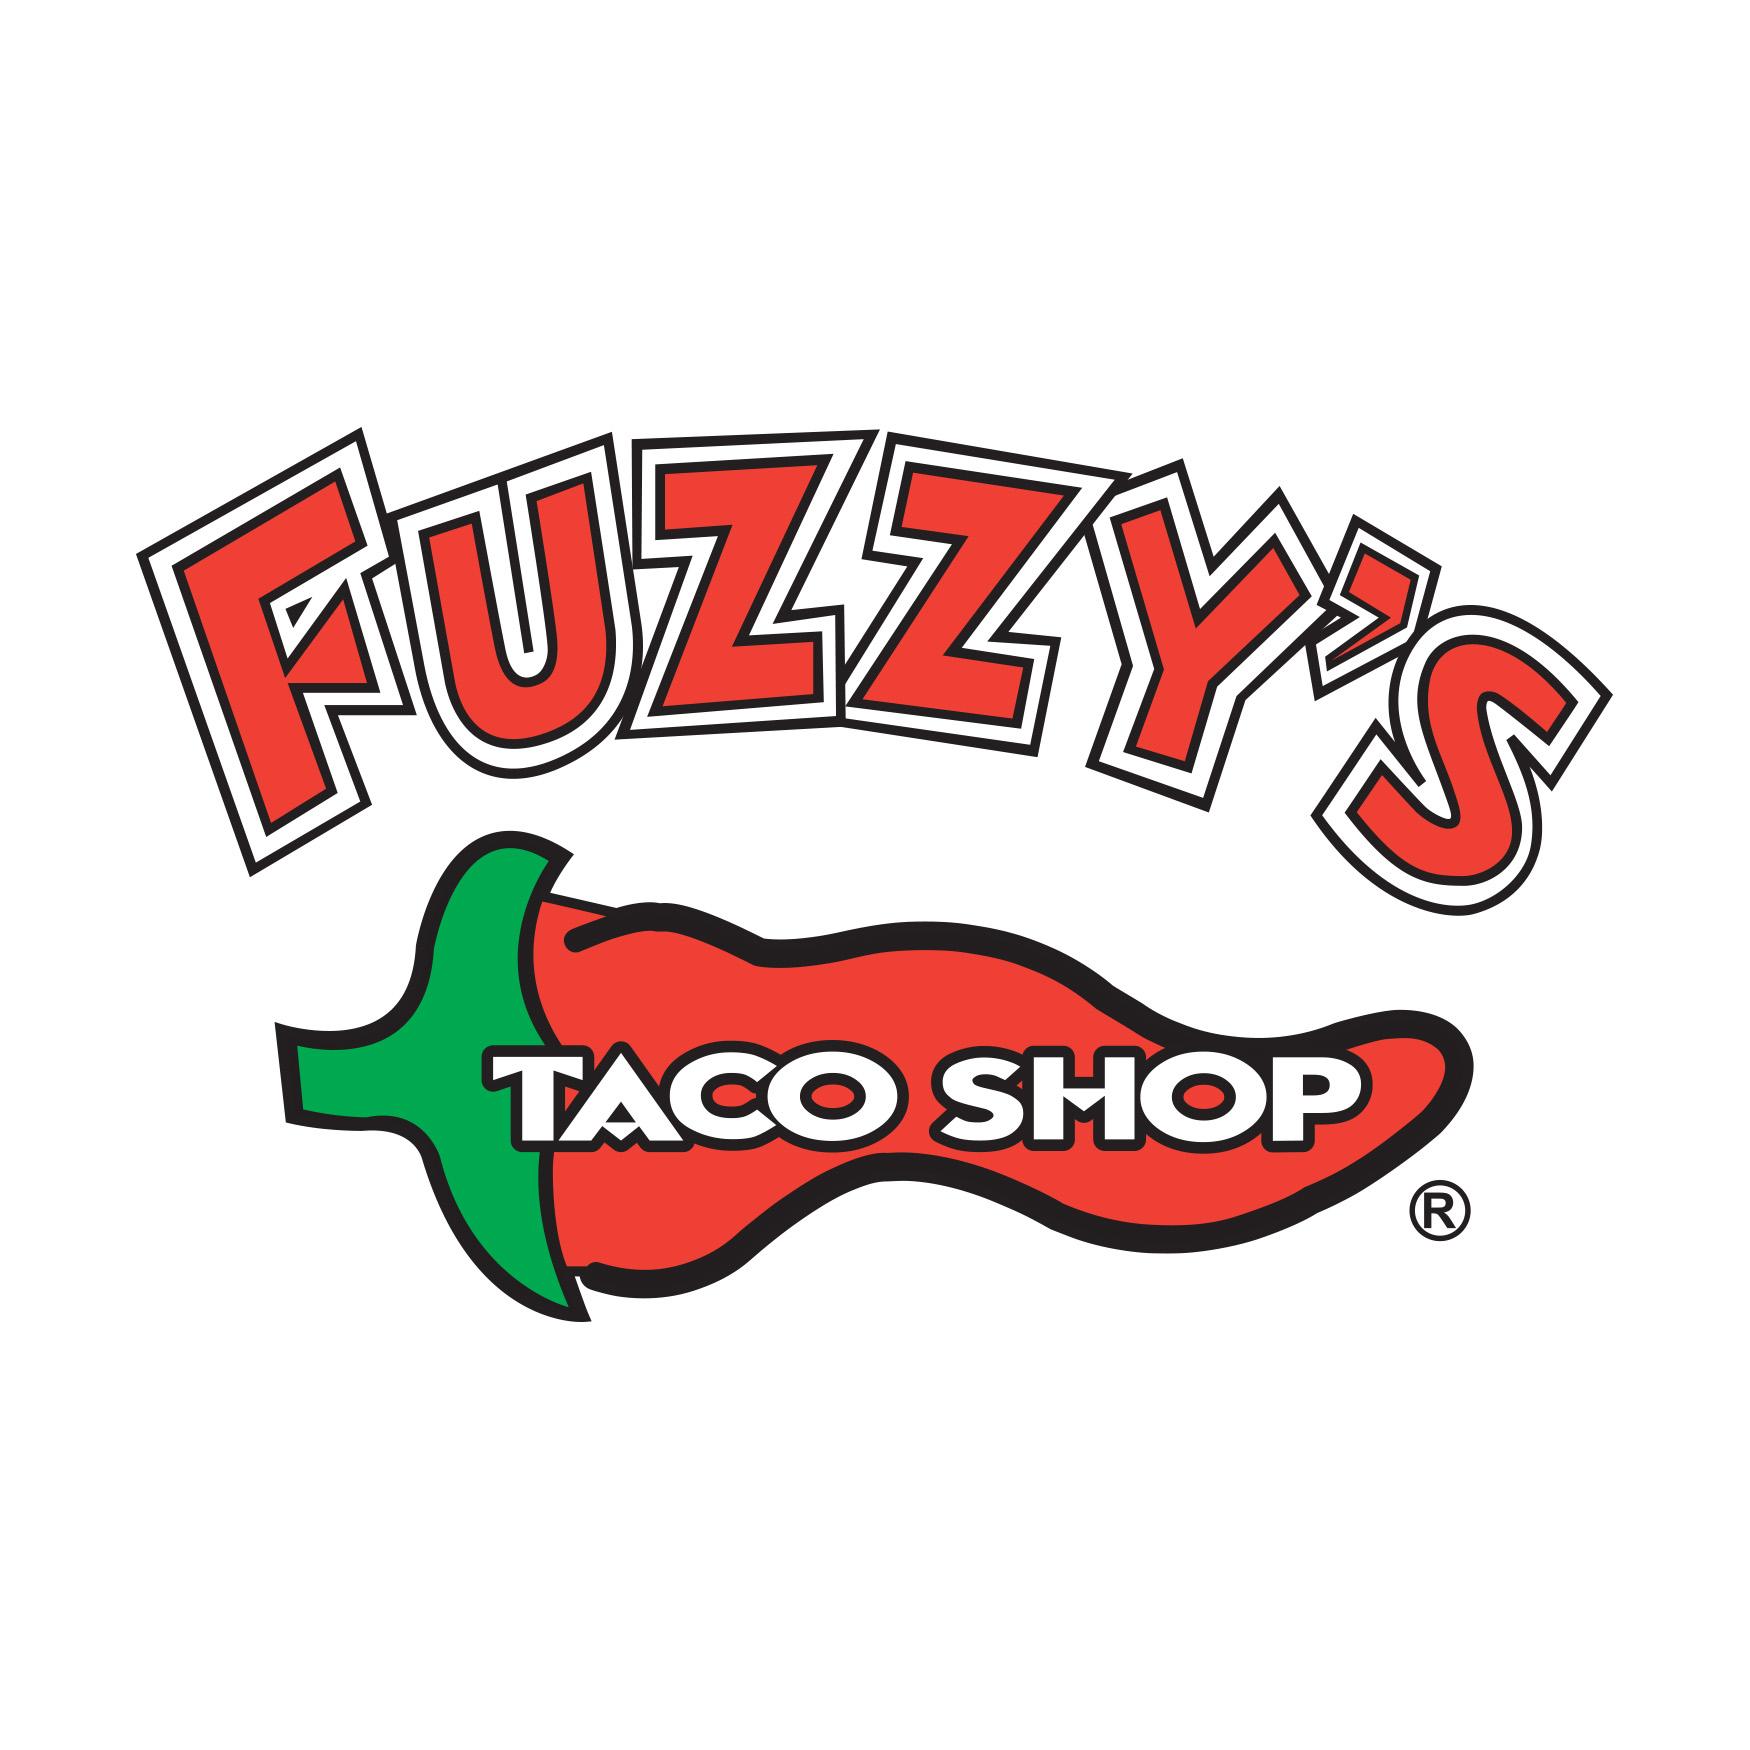 Fuzzys_1750pixelsSquare.jpg